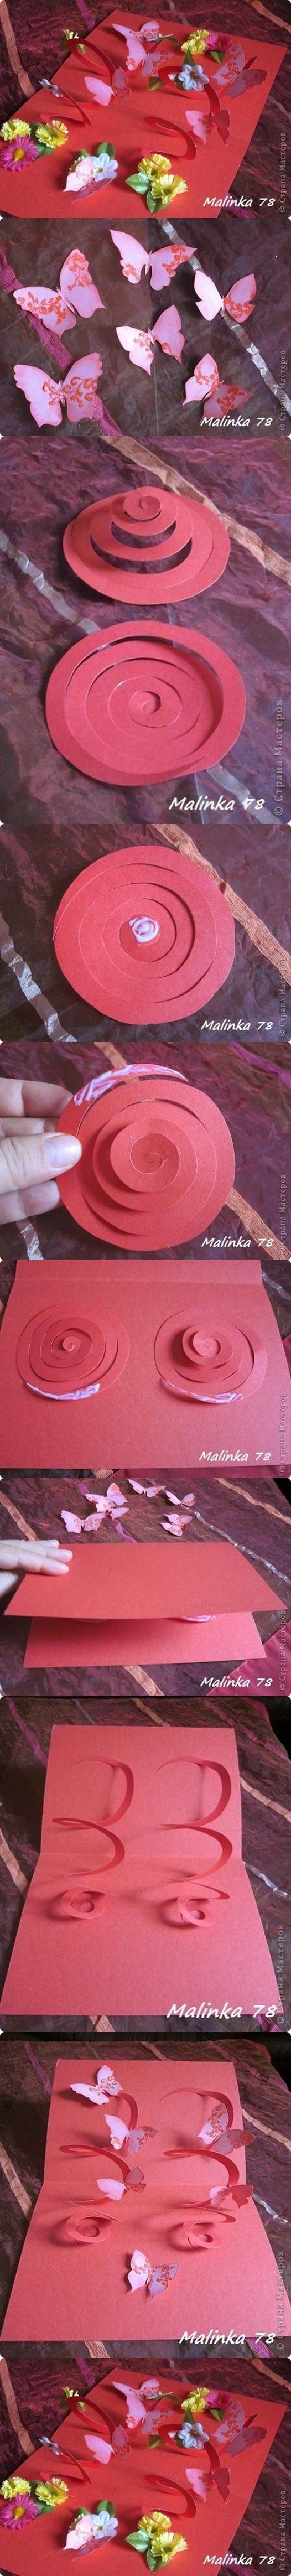 05aff06079d530da668291b1f2e183ec--craft-images-happy-birthday-cards Incroyable De Salon De Jardin Fer forgé Occasion Conception